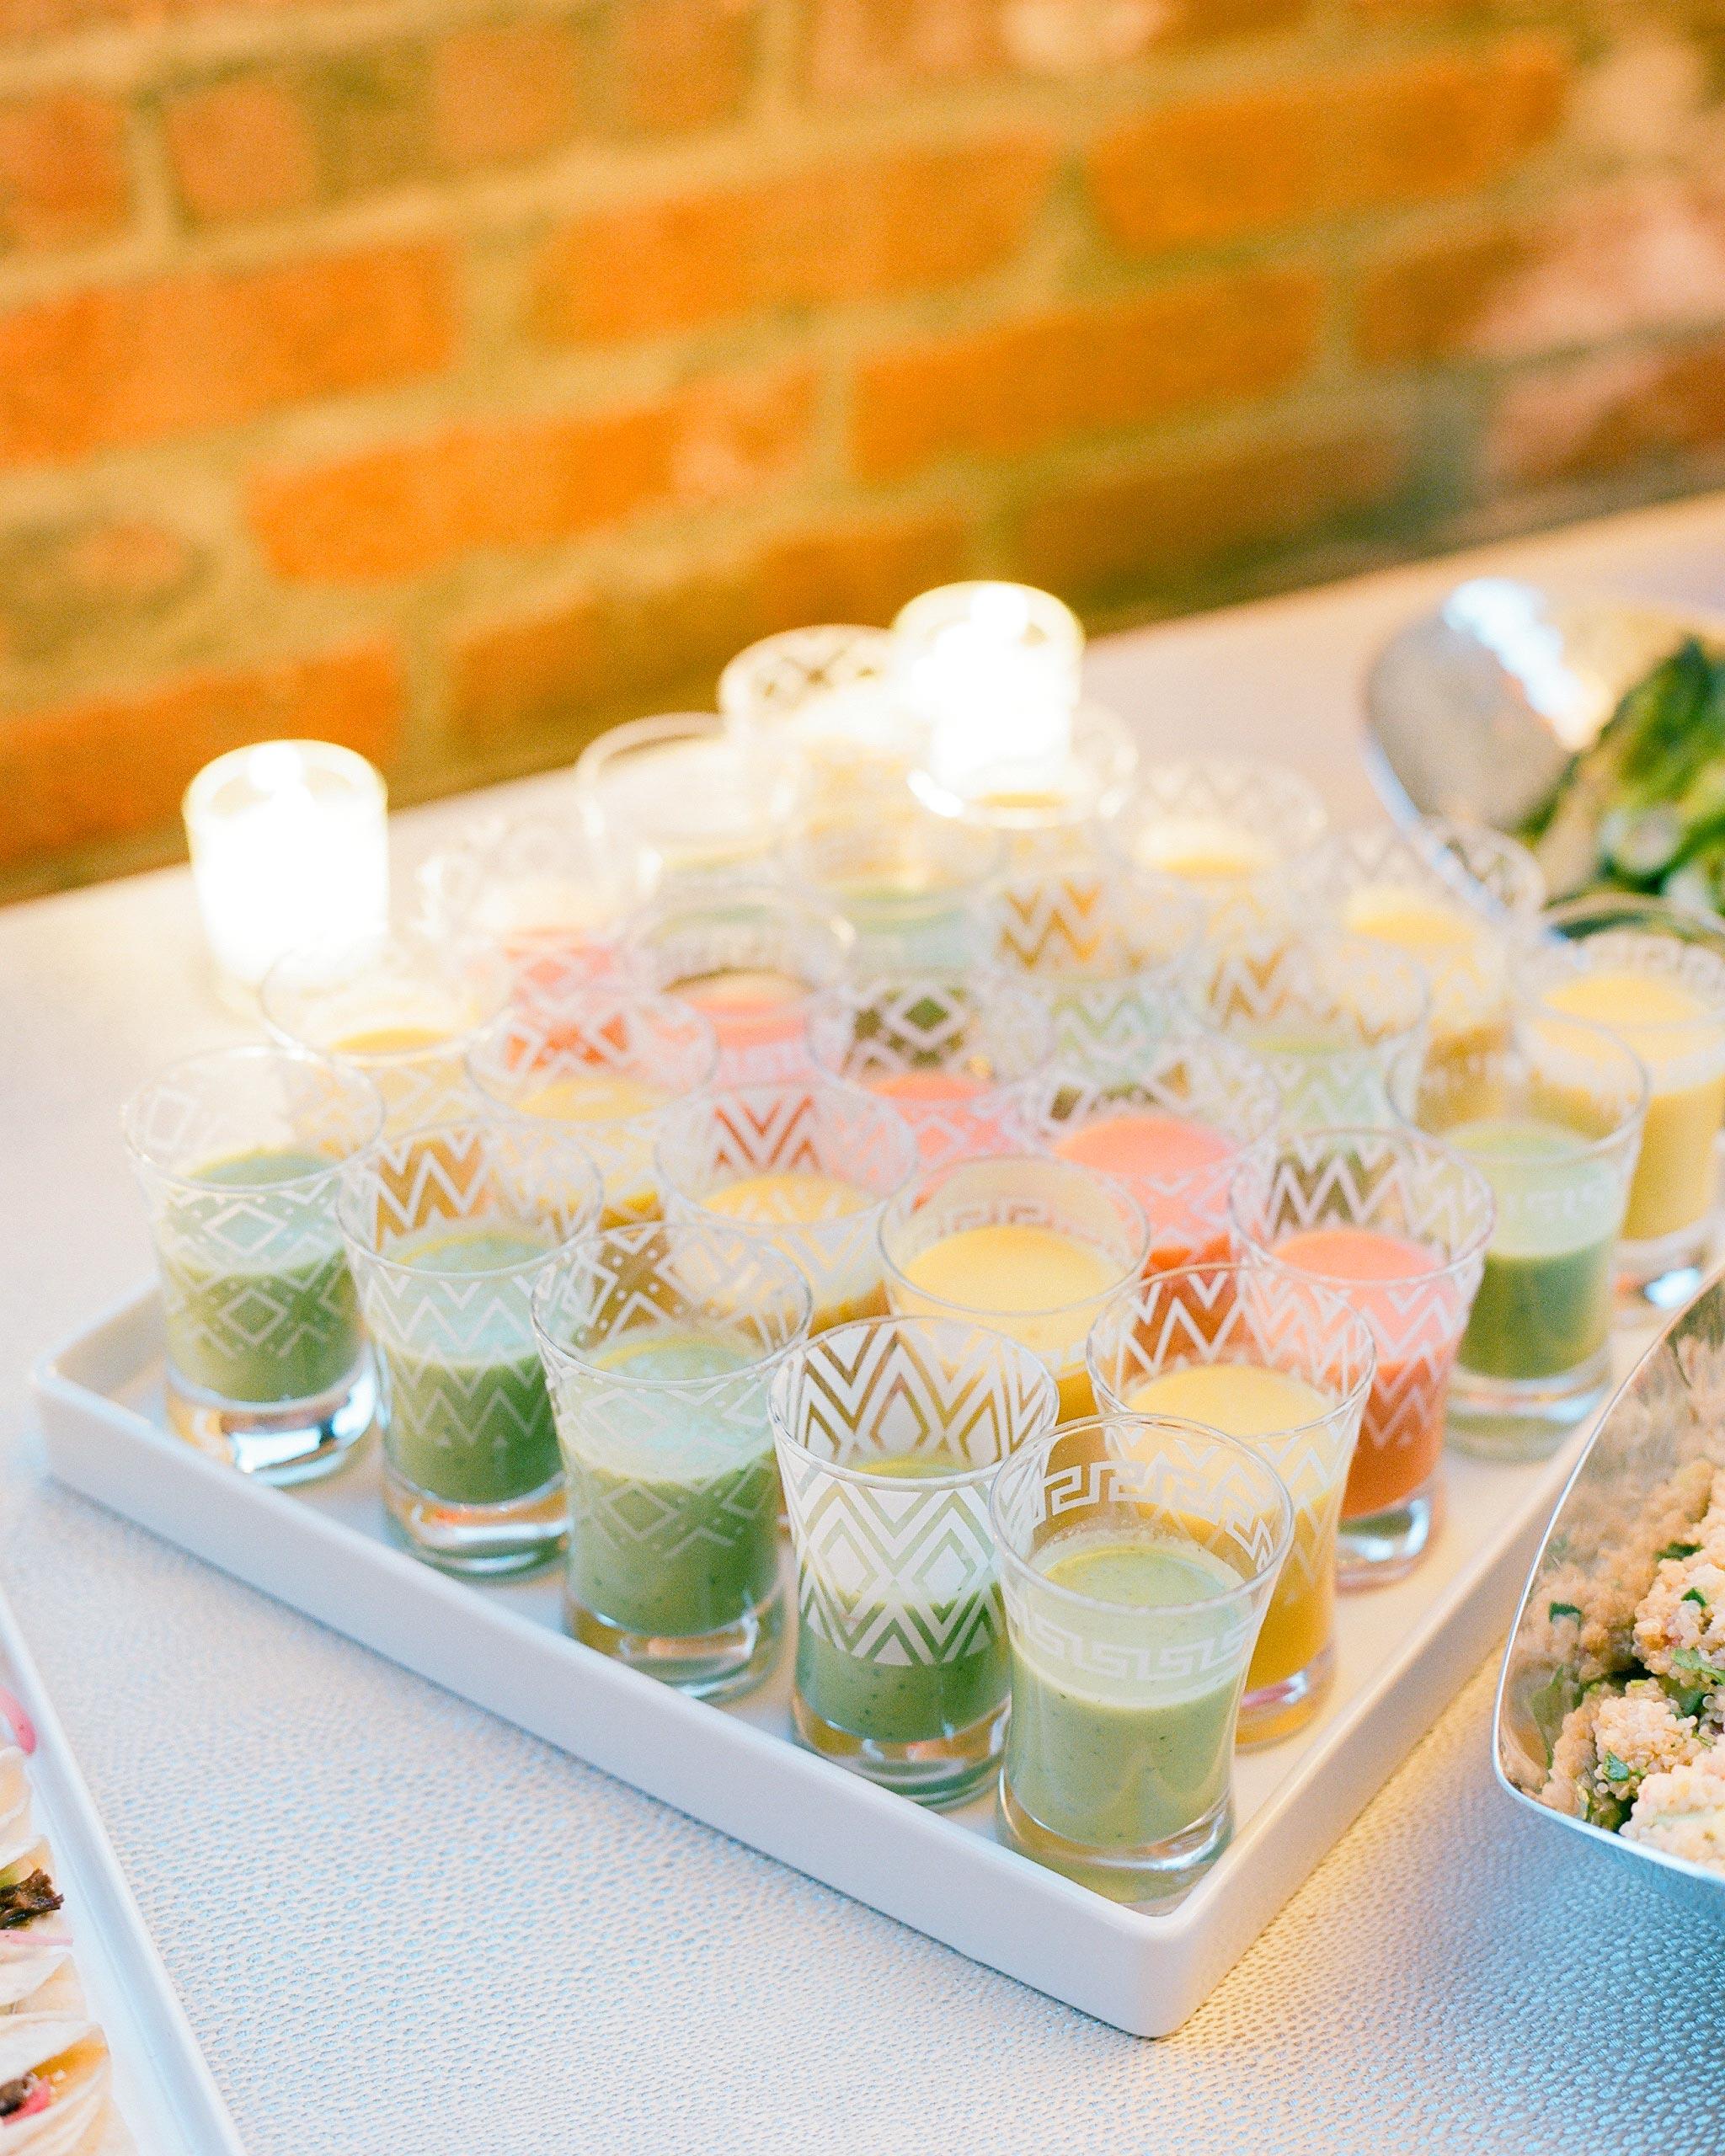 spring-summer-food-trends-juice-shots-0516.jpg